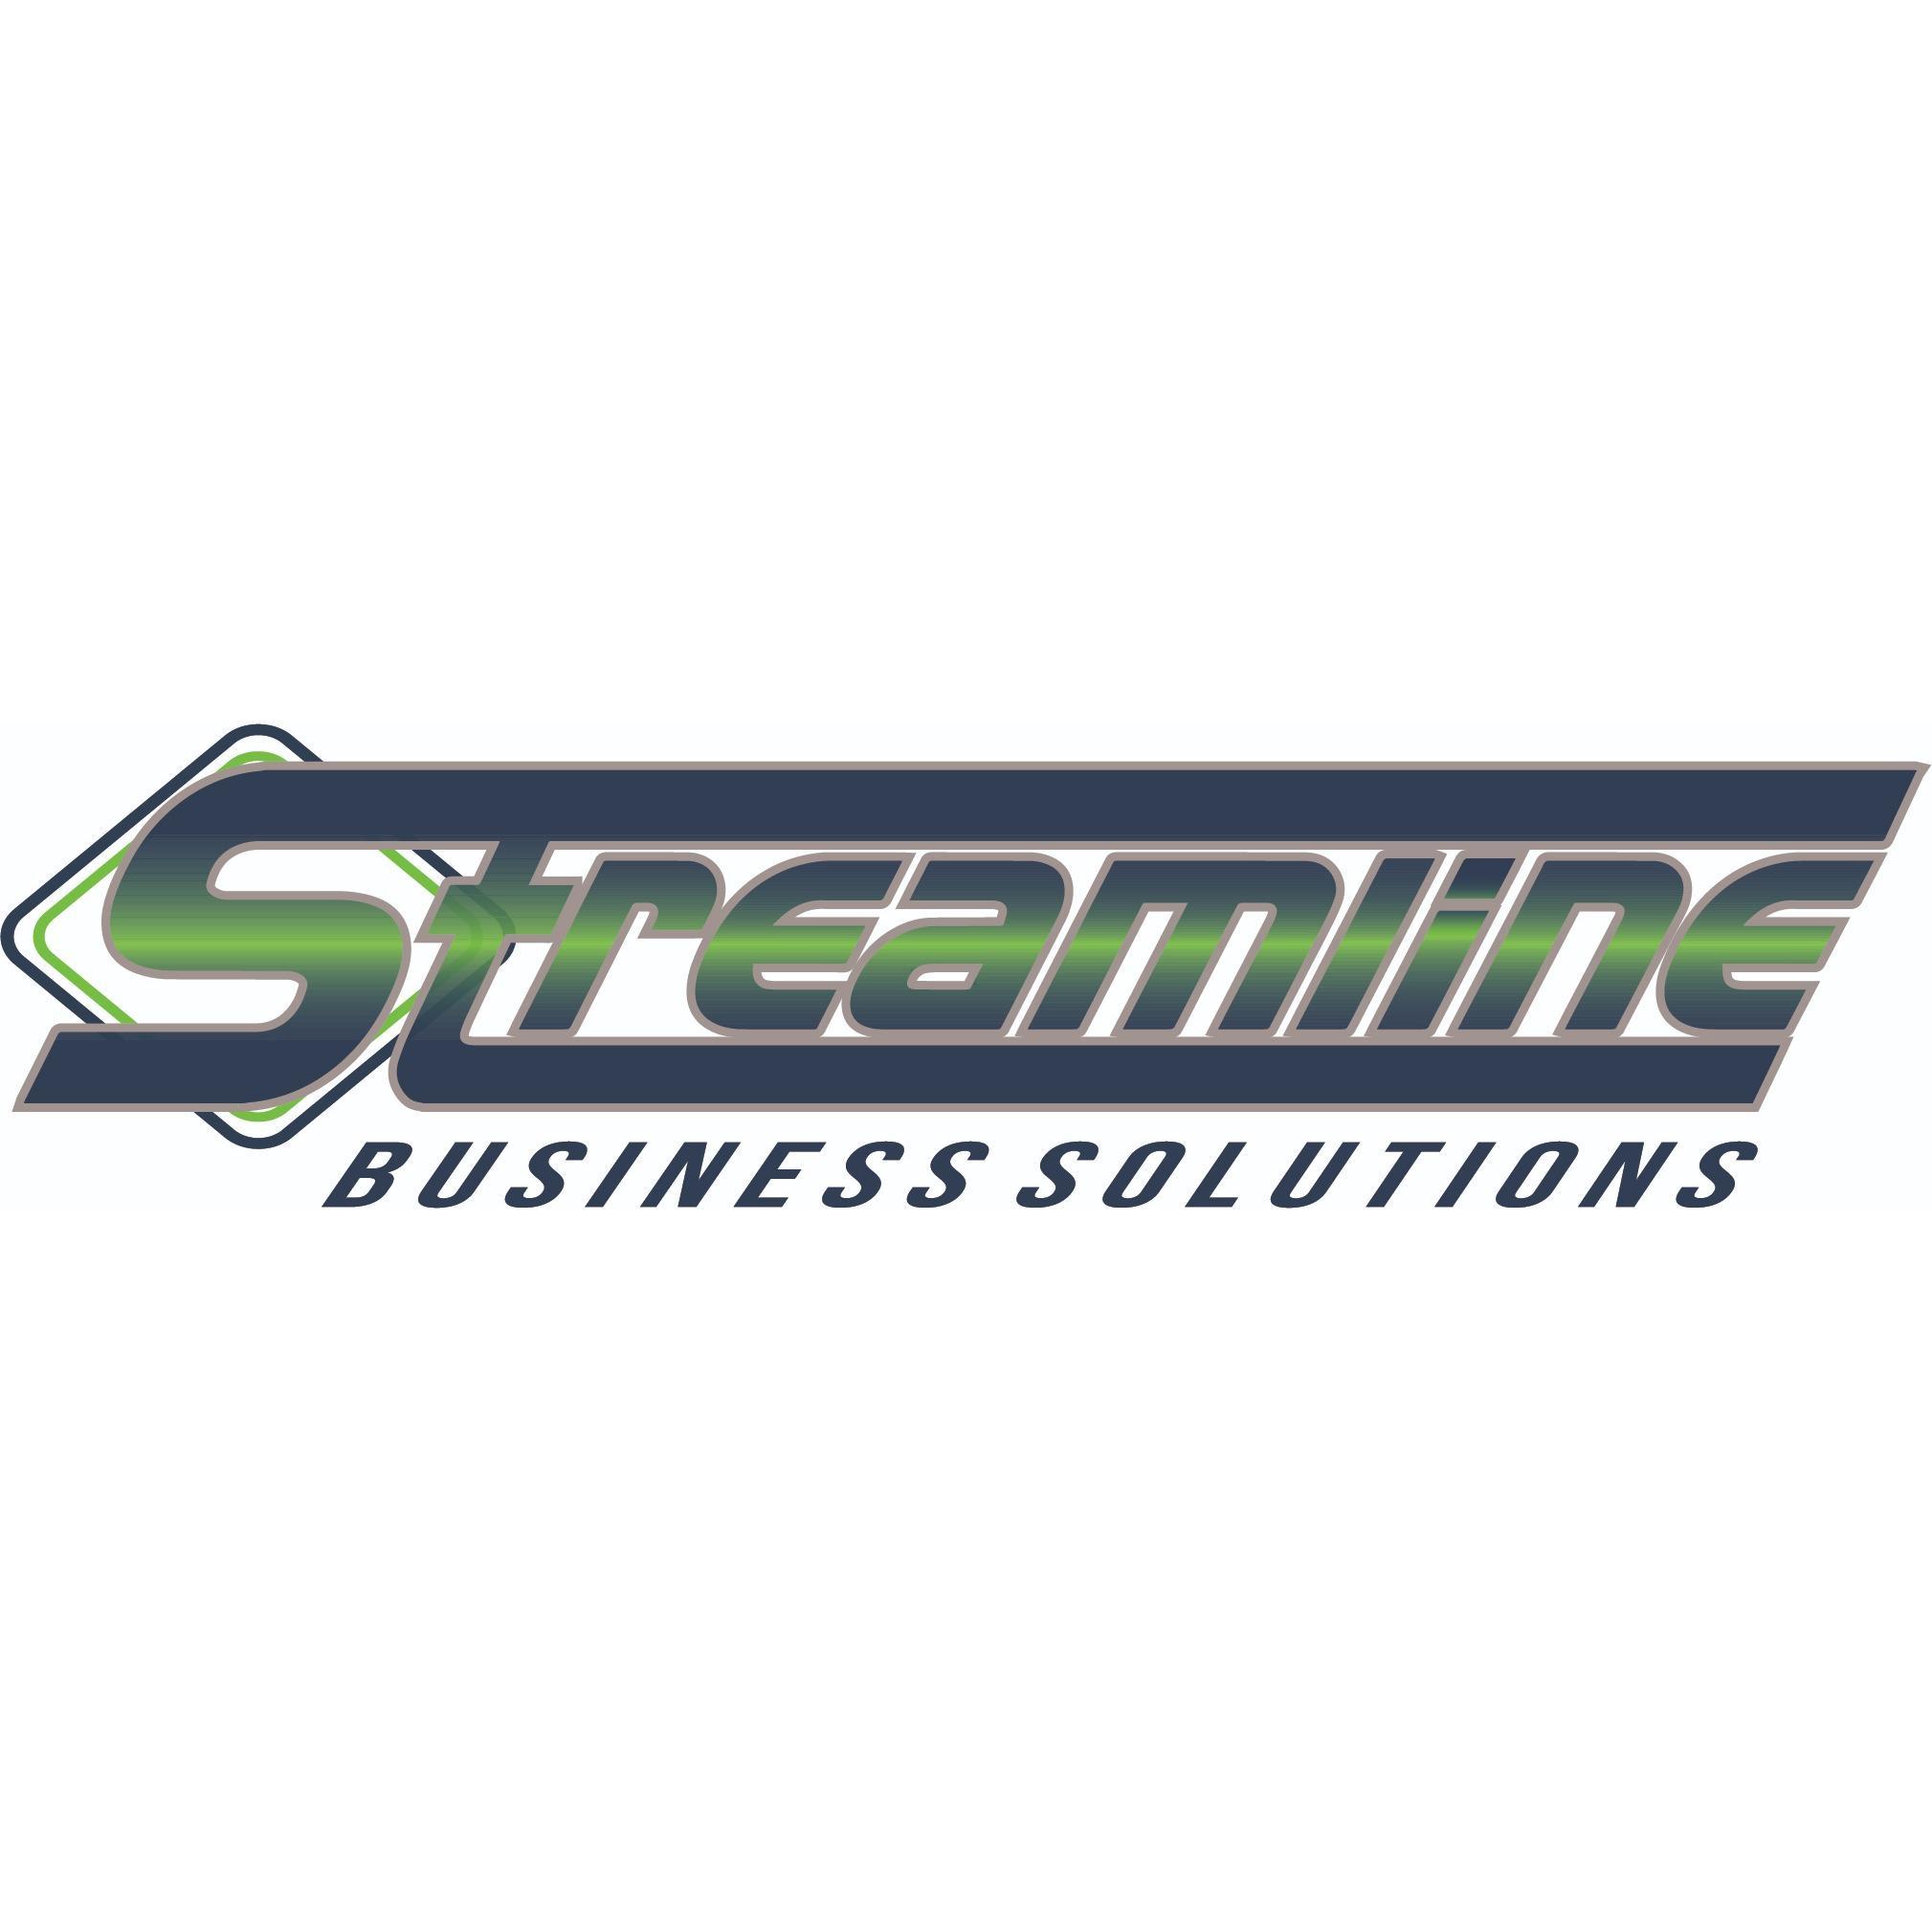 Streamline Business Solutions